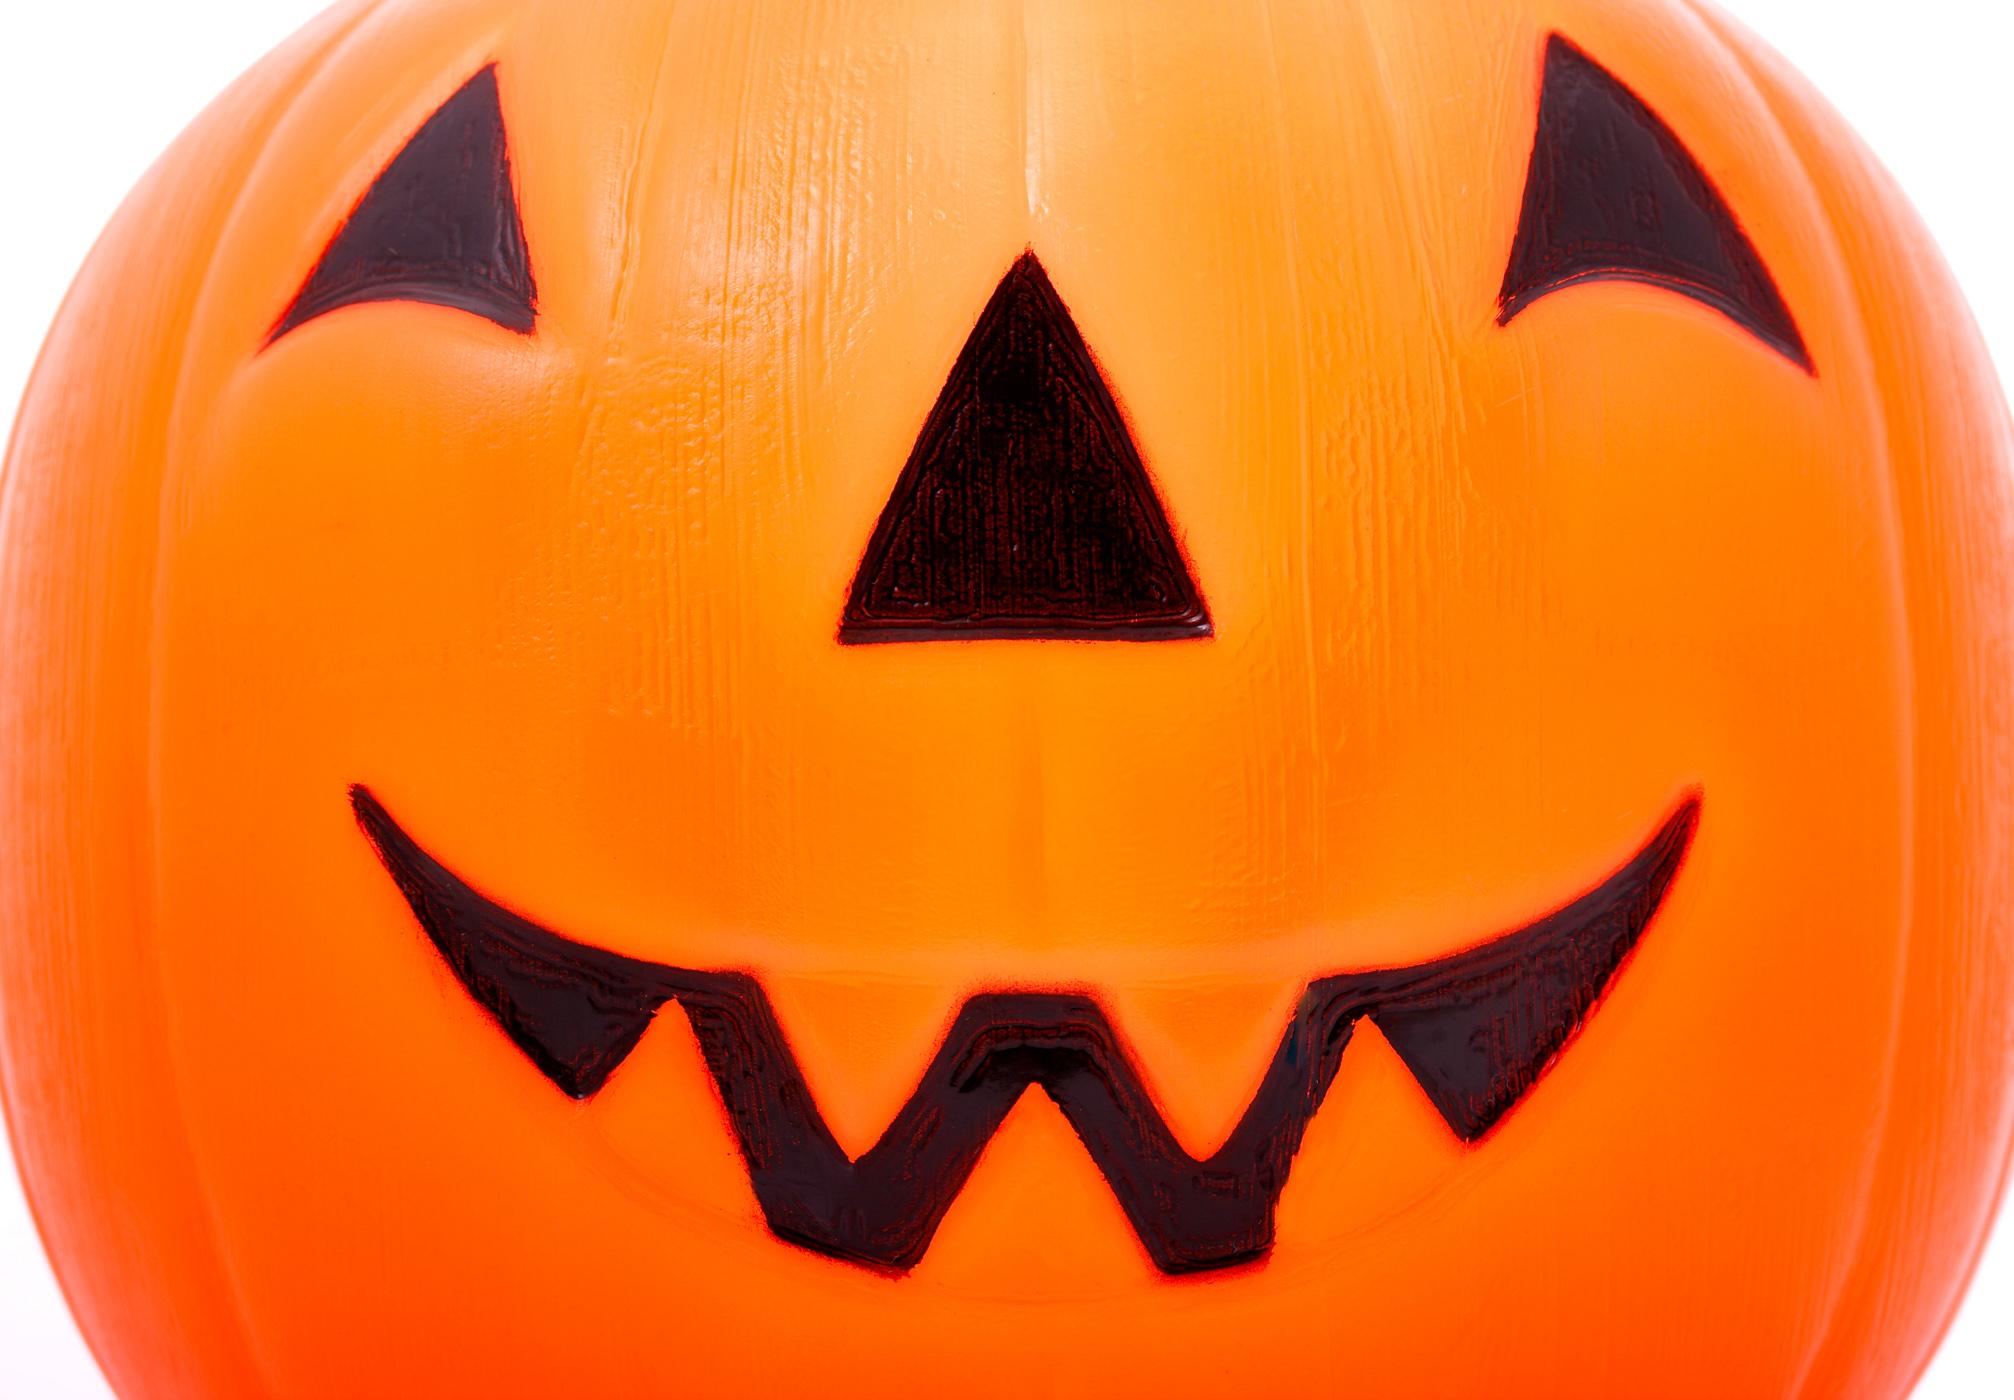 Halloween Pumpkin For Trick Or Treat, Artistic, Jack-o-lantern, Trick, Treat, HQ Photo